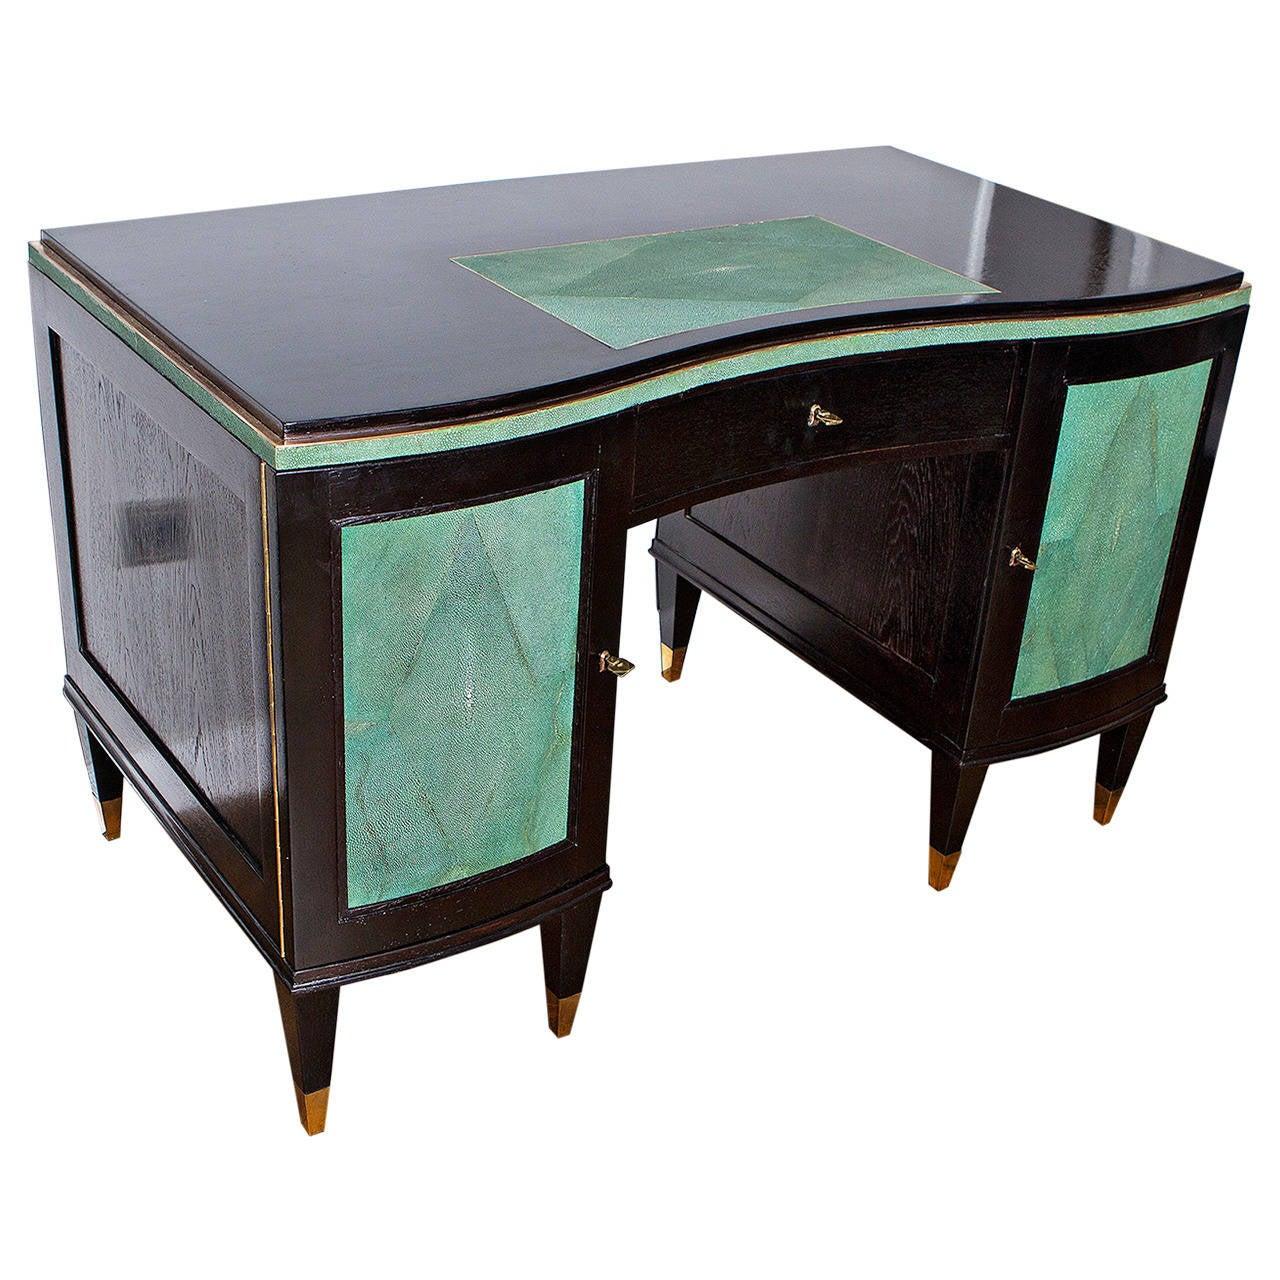 Elegant Art Deco Desk France circa 1935 at 1stdibs